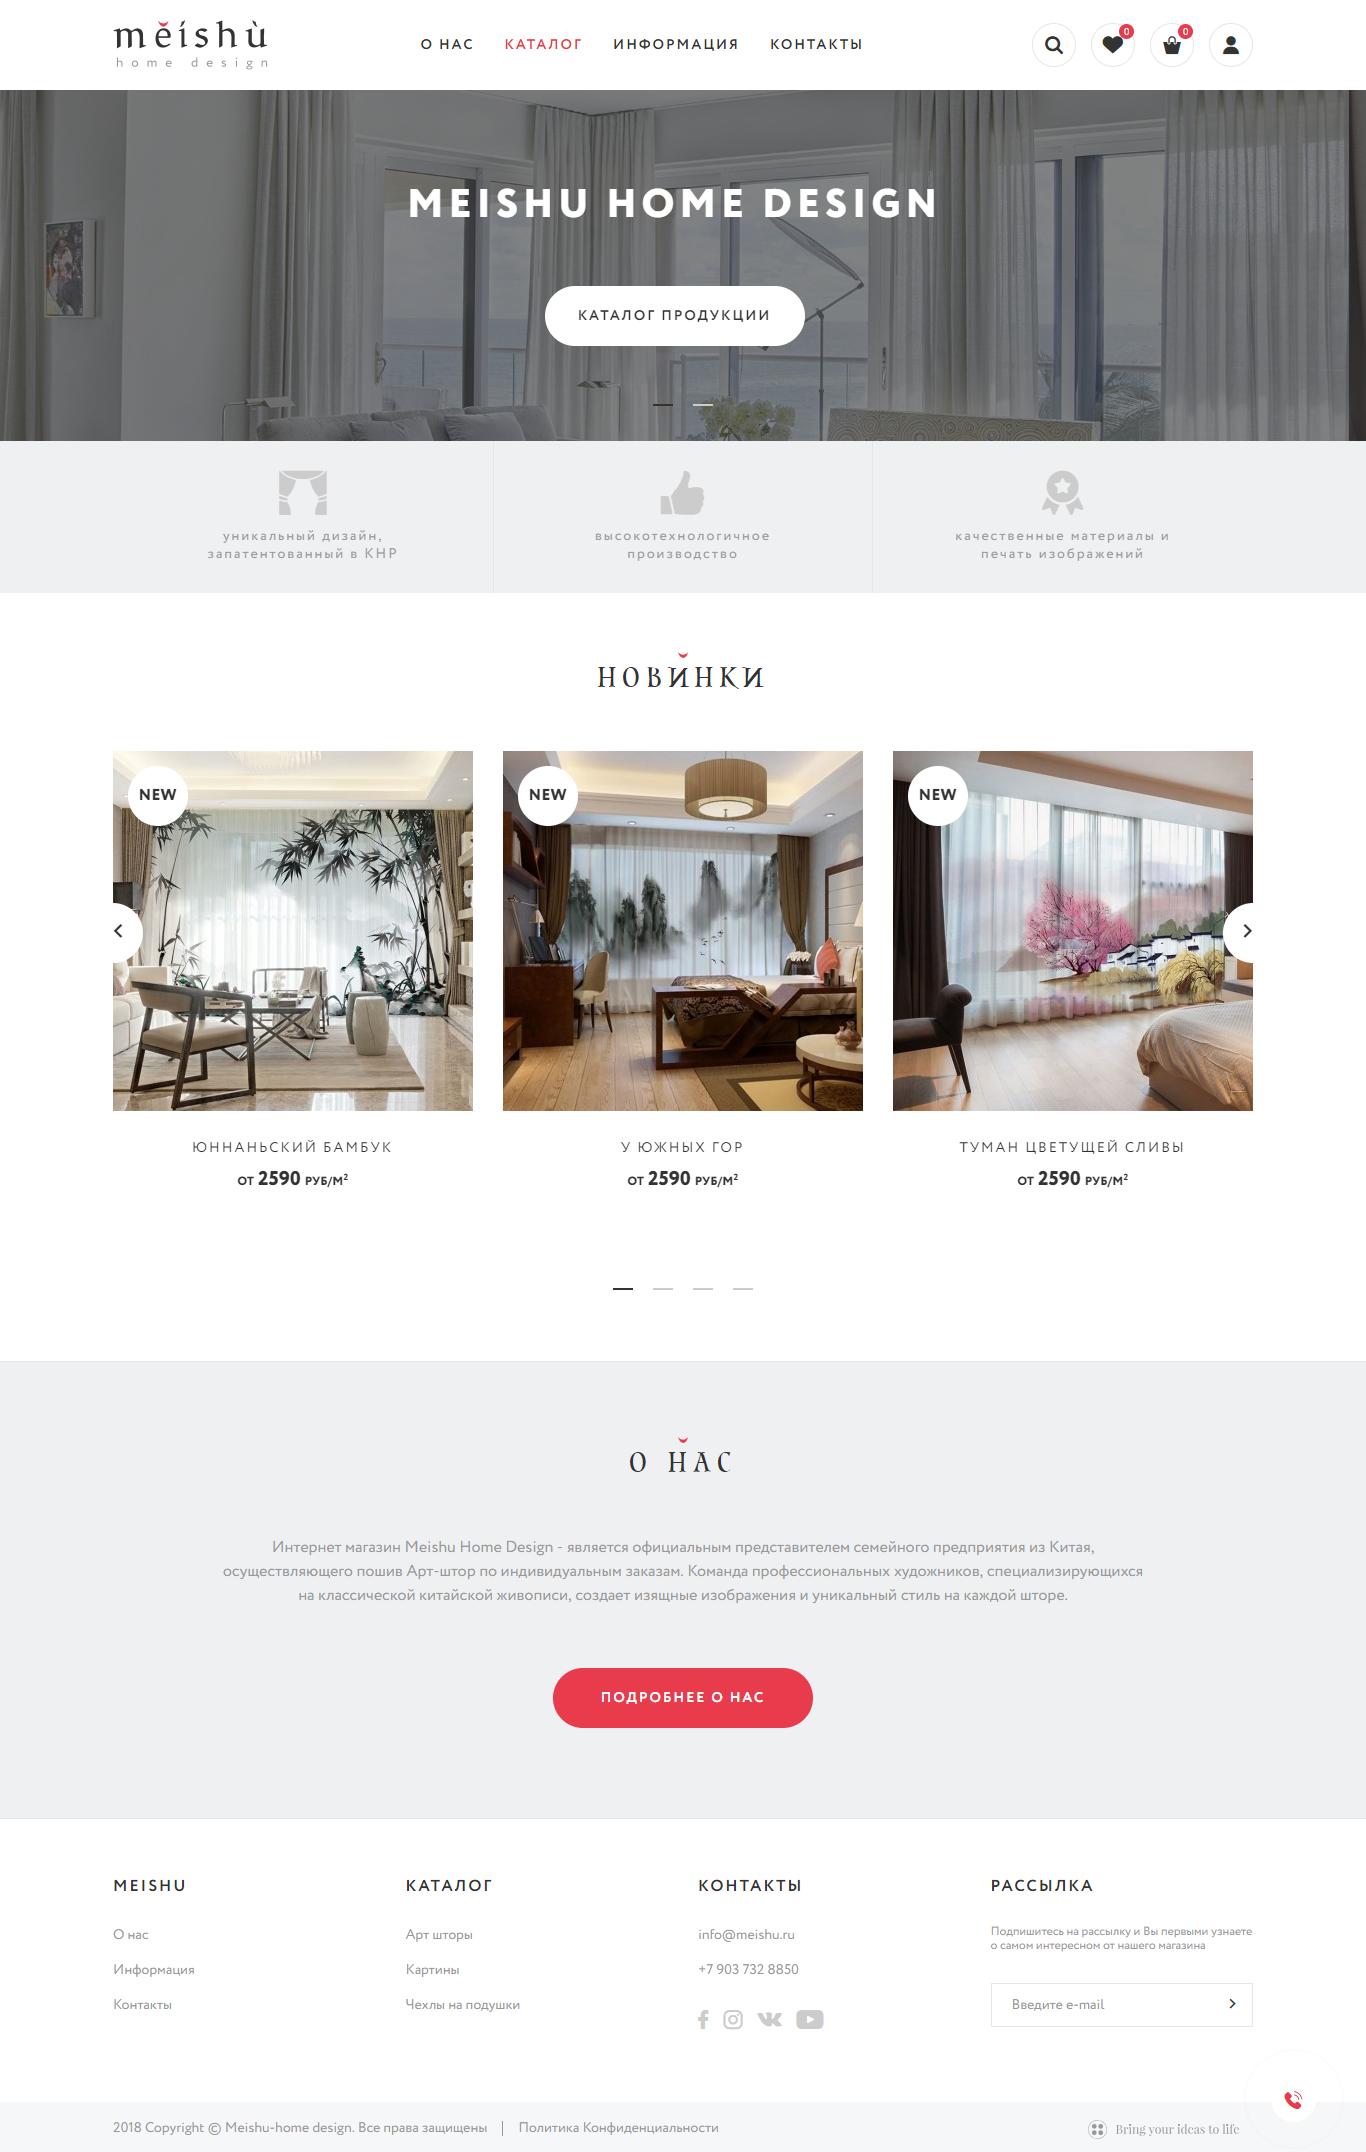 Meishu Home Design